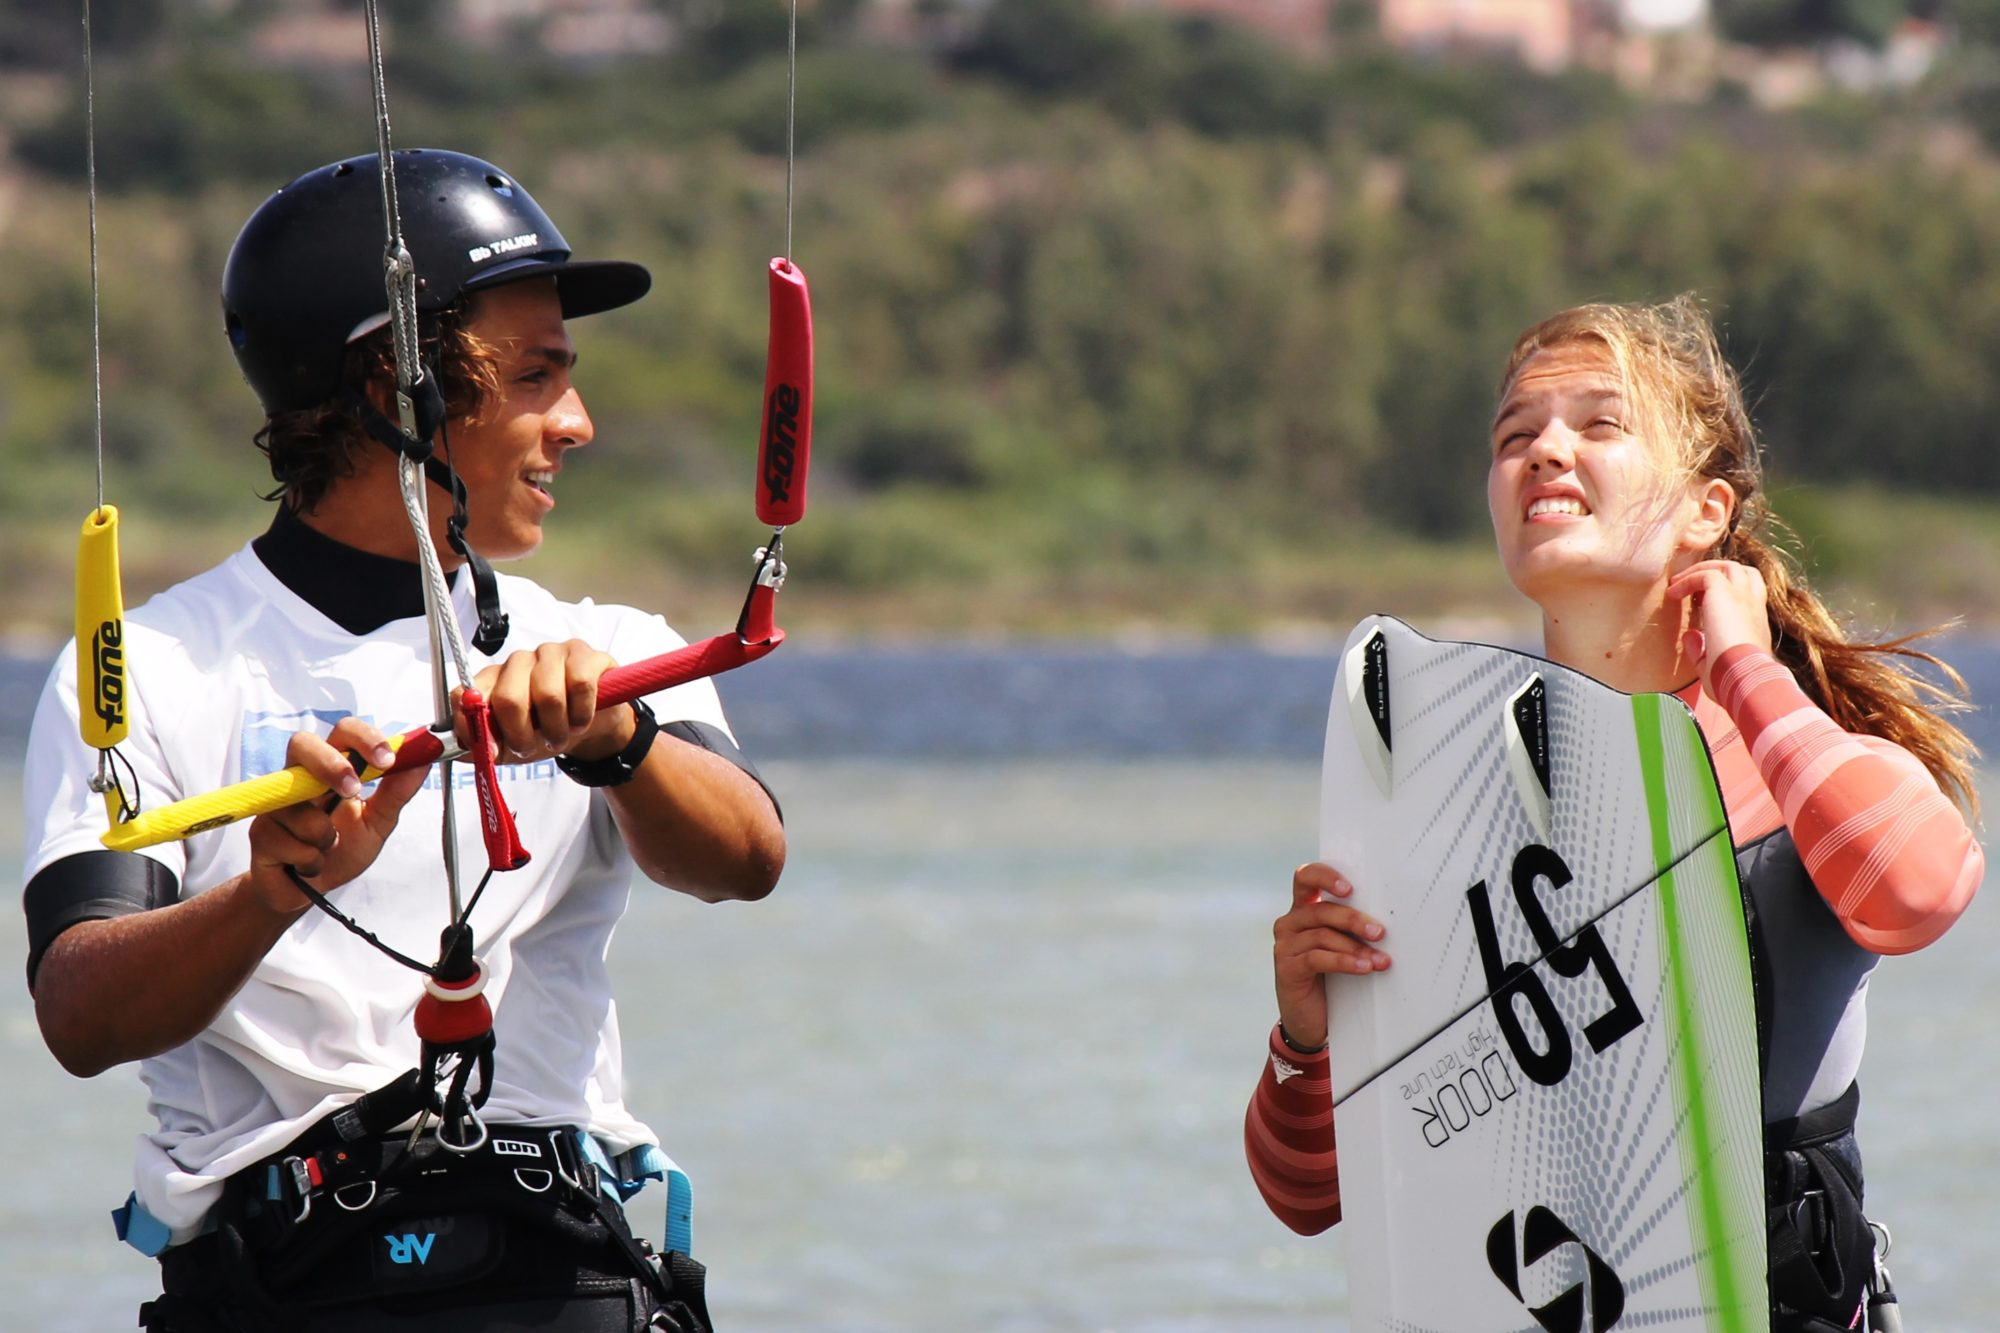 Kitesurf Lernen in Südsardinien: KIten Lernen auf Sardinien, Punta Trettu, Cagliari, Villasimius